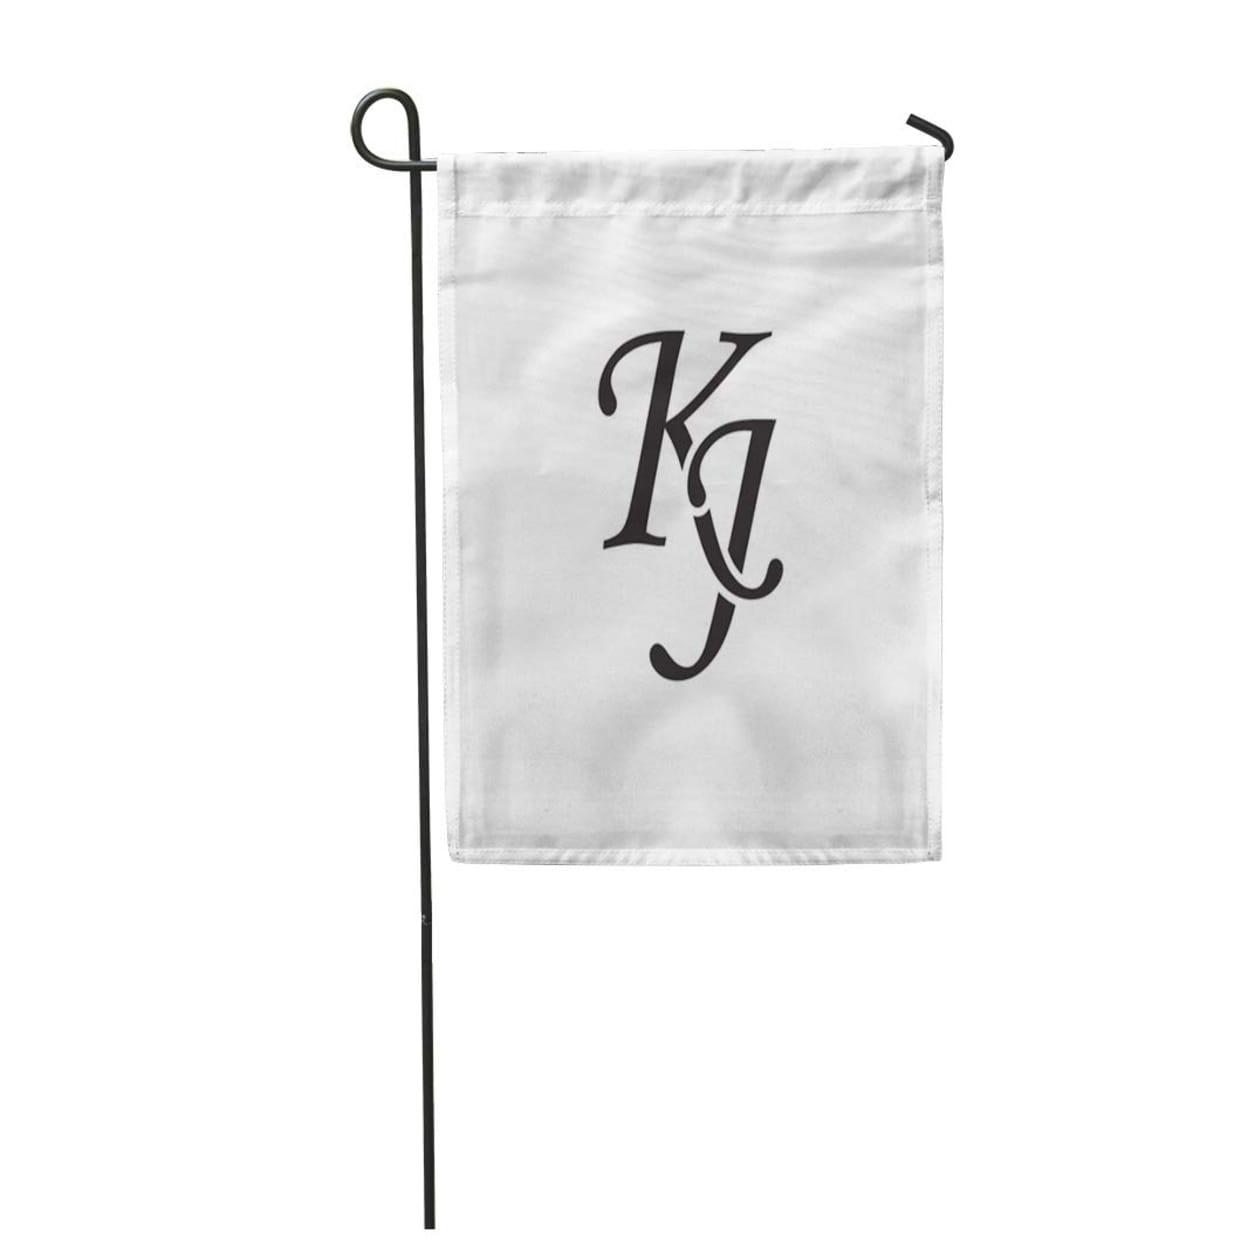 Shop Abstract Kj Initial Monogram Antique Black Boutique Brand Classic Elegance Garden Flag Decorative Flag House Banner 12x1 Overstock 31389927